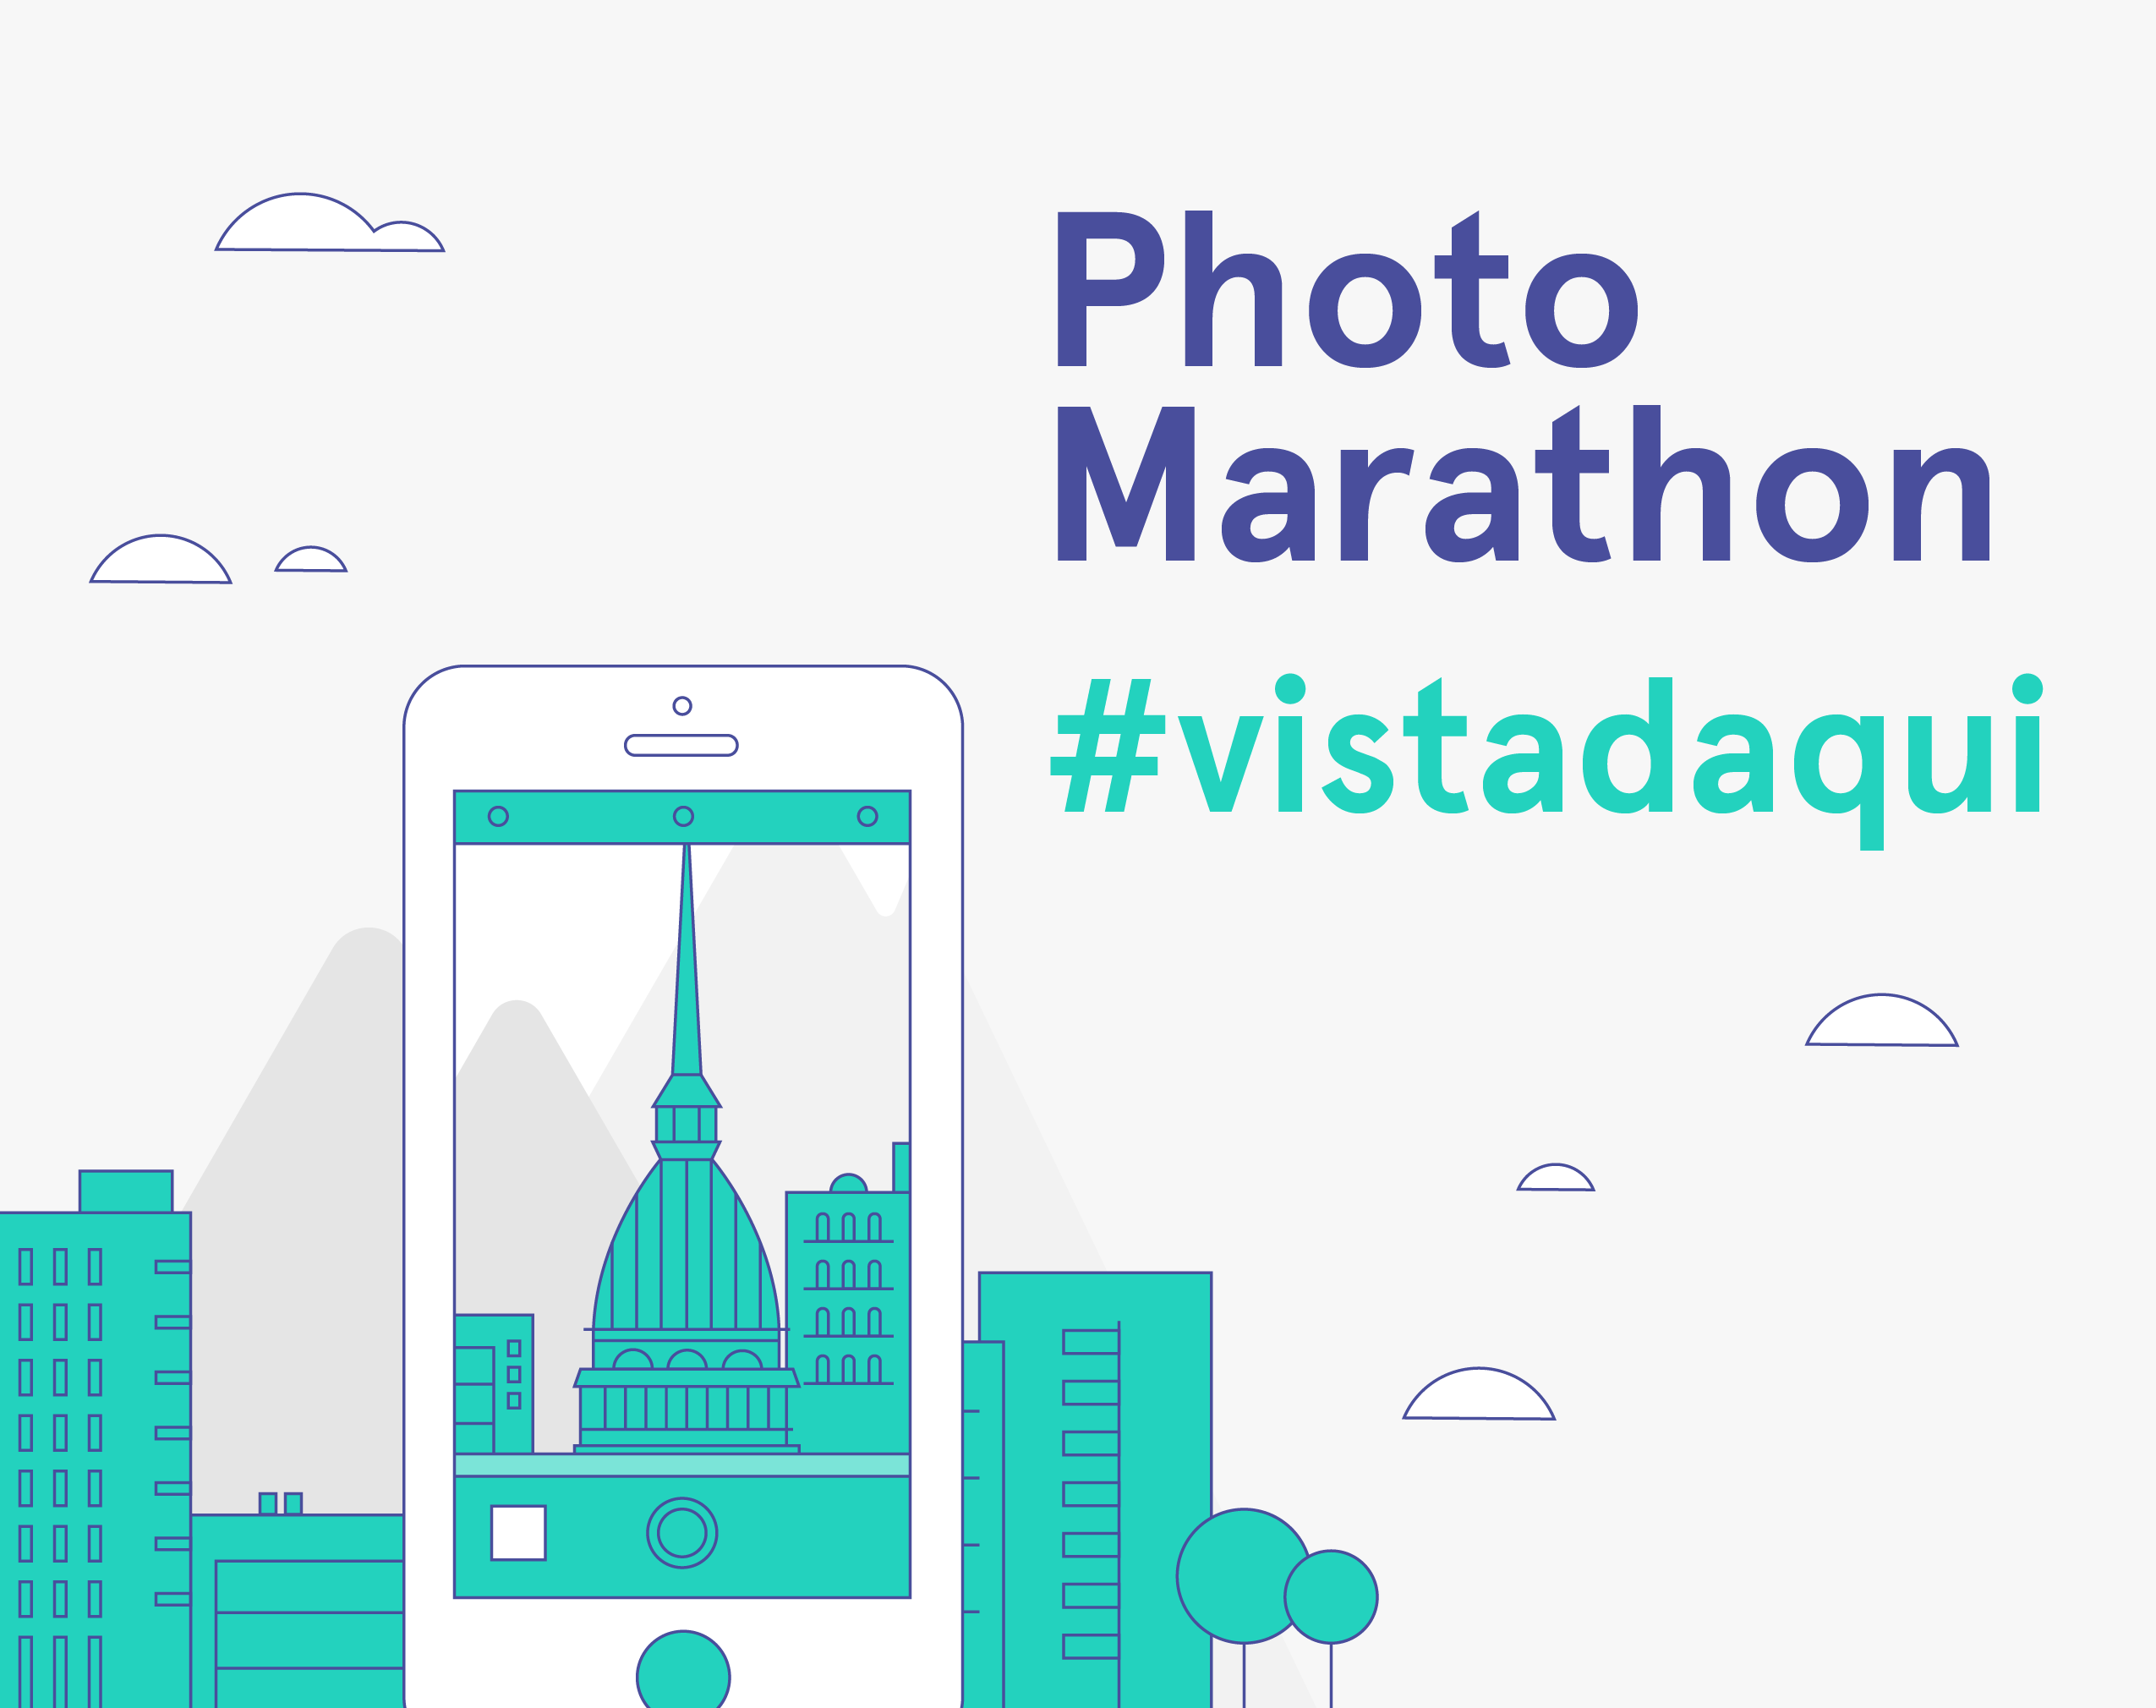 vistadaqui, photo marathon